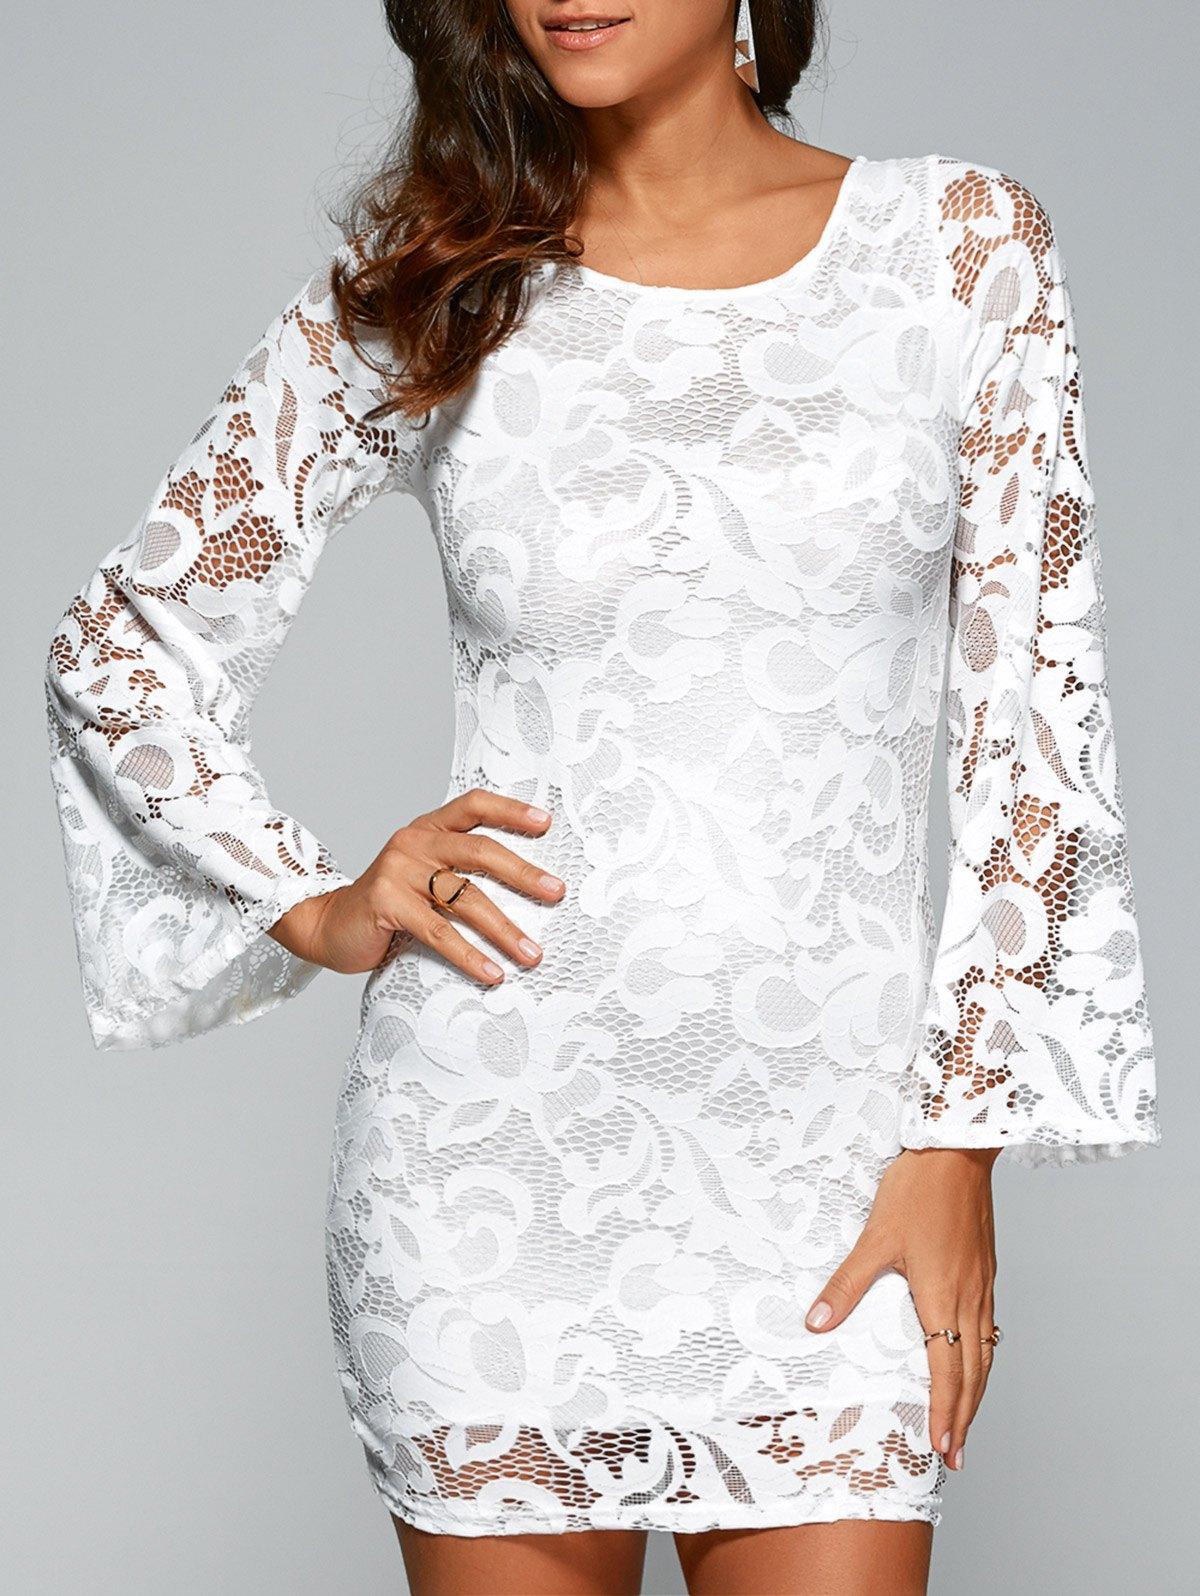 Flare Sleeve Lace-Up Lace Sheath Dress